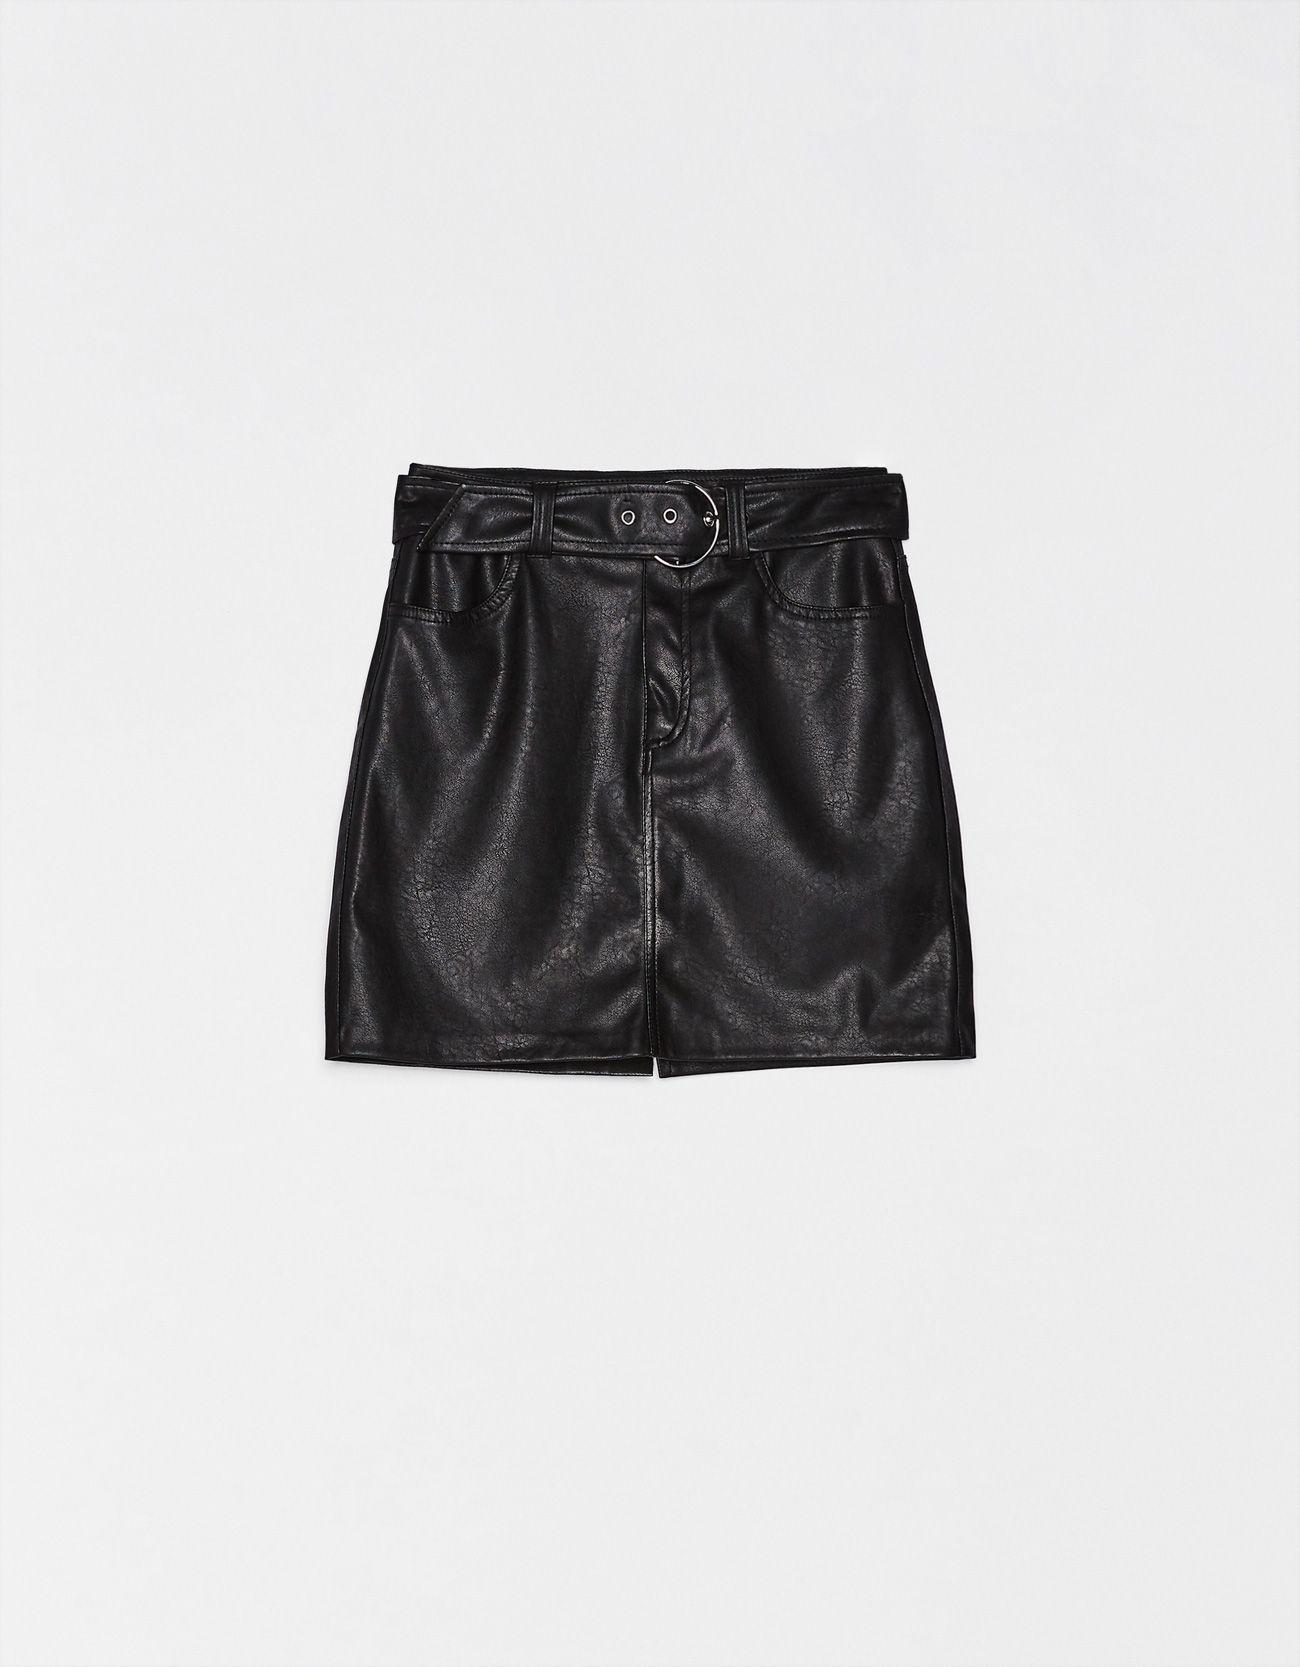 Falda Mini Efecto Piel Faldas Bershka España Everyday Outfits Buy Clothes Women